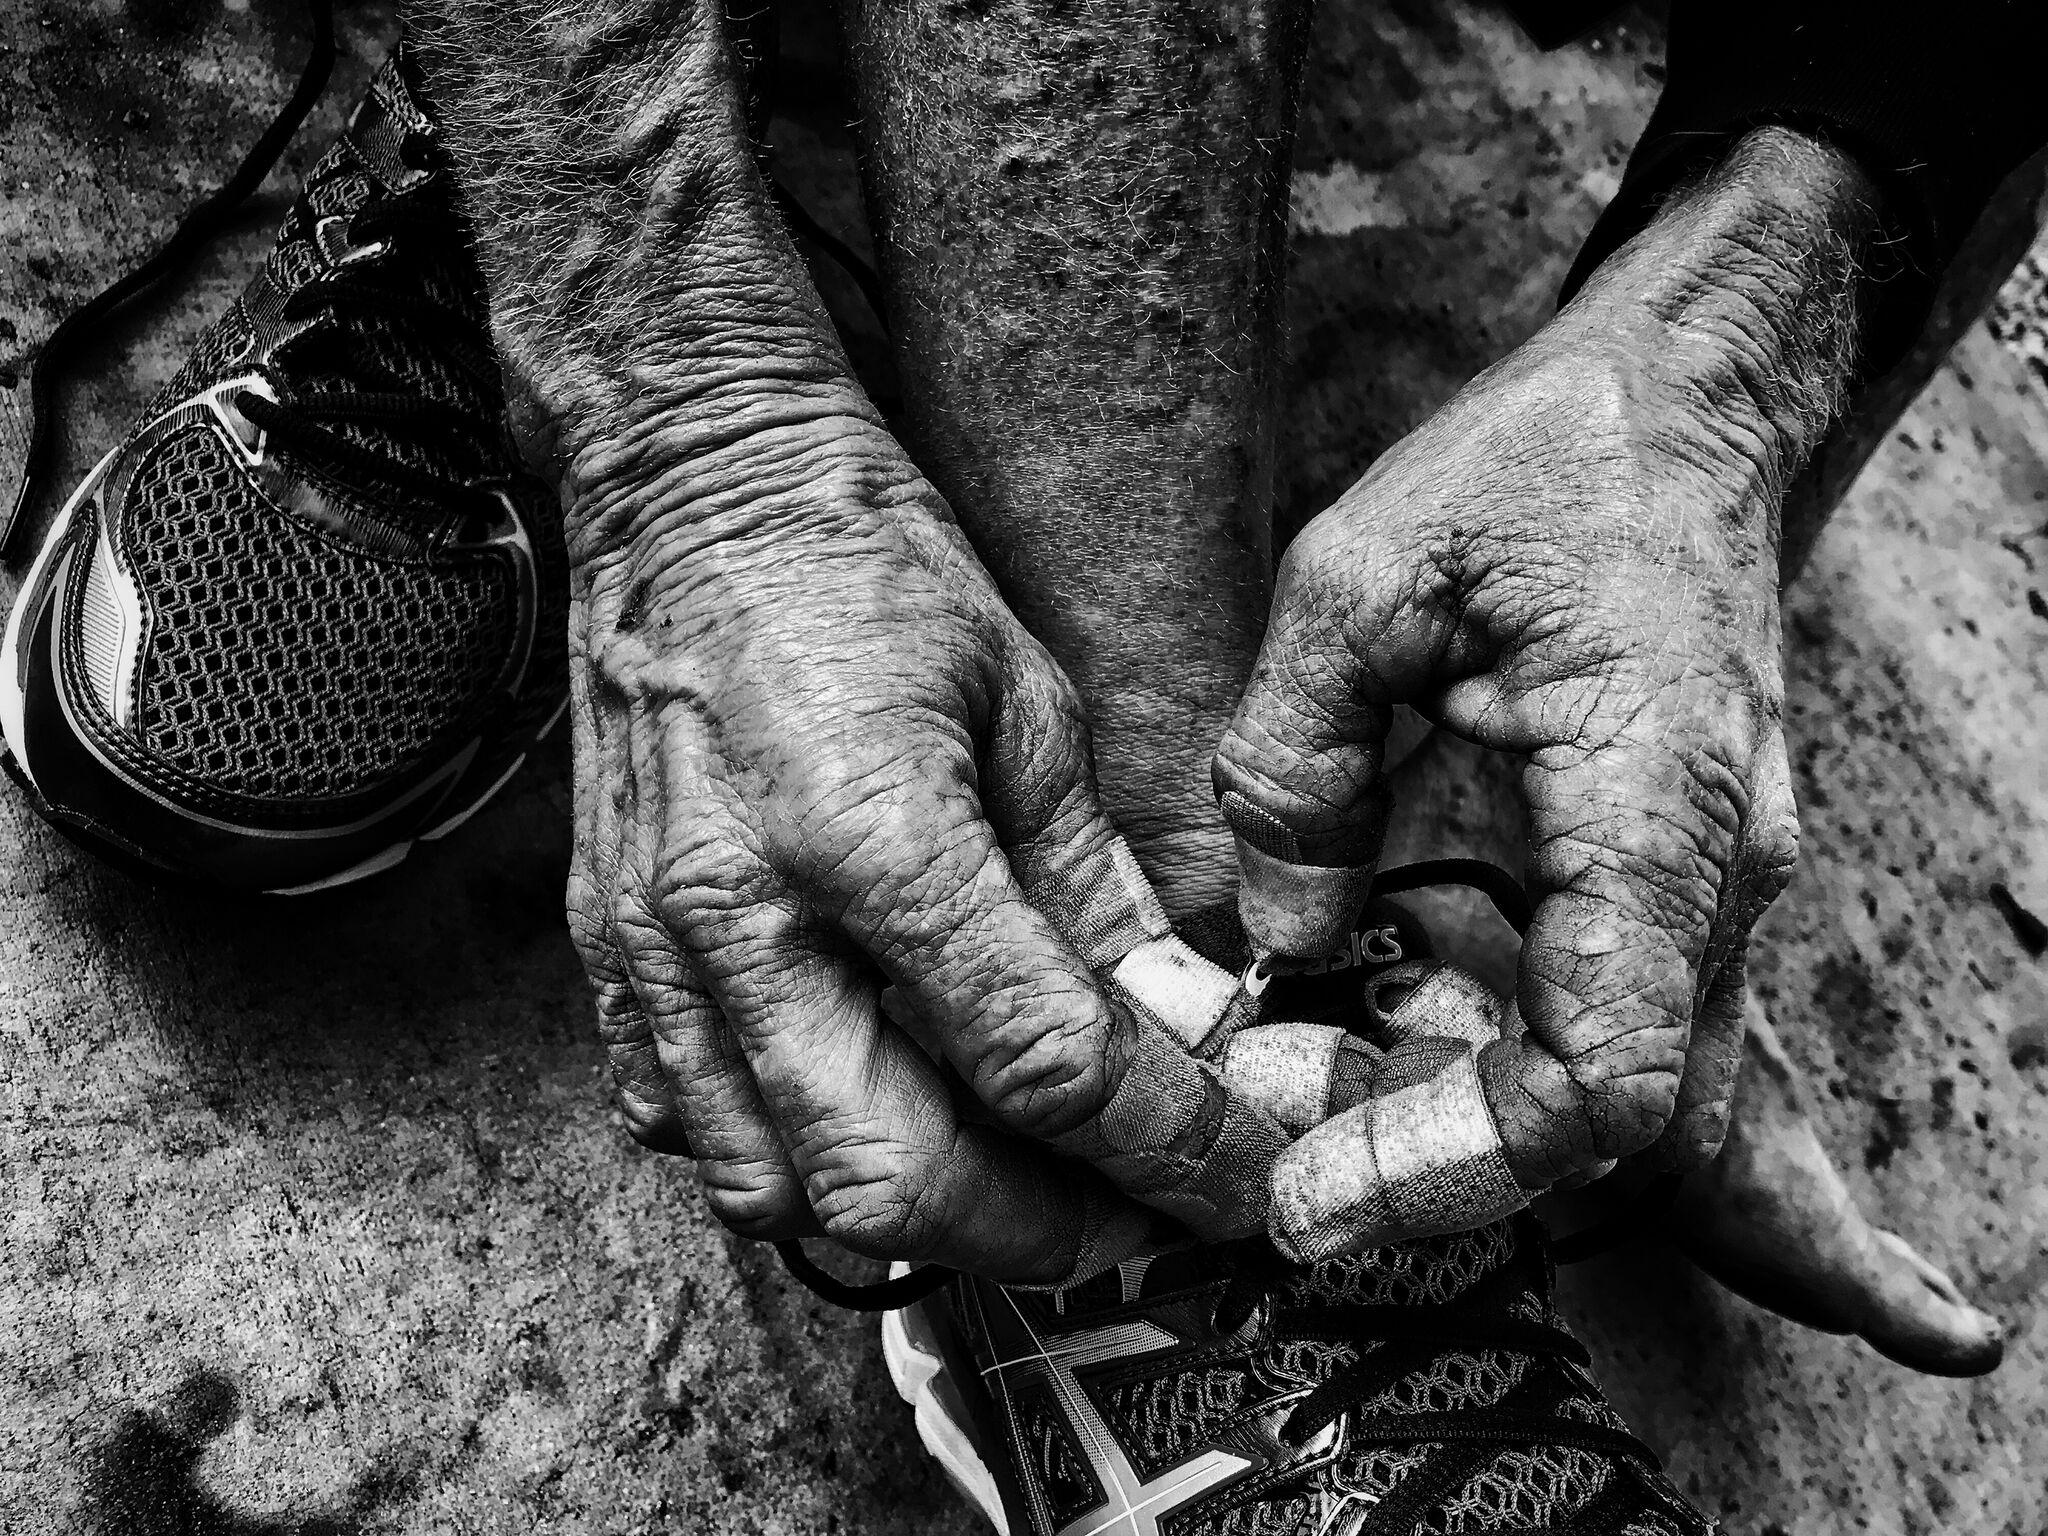 Portraits of homelessness david blumenkrantz